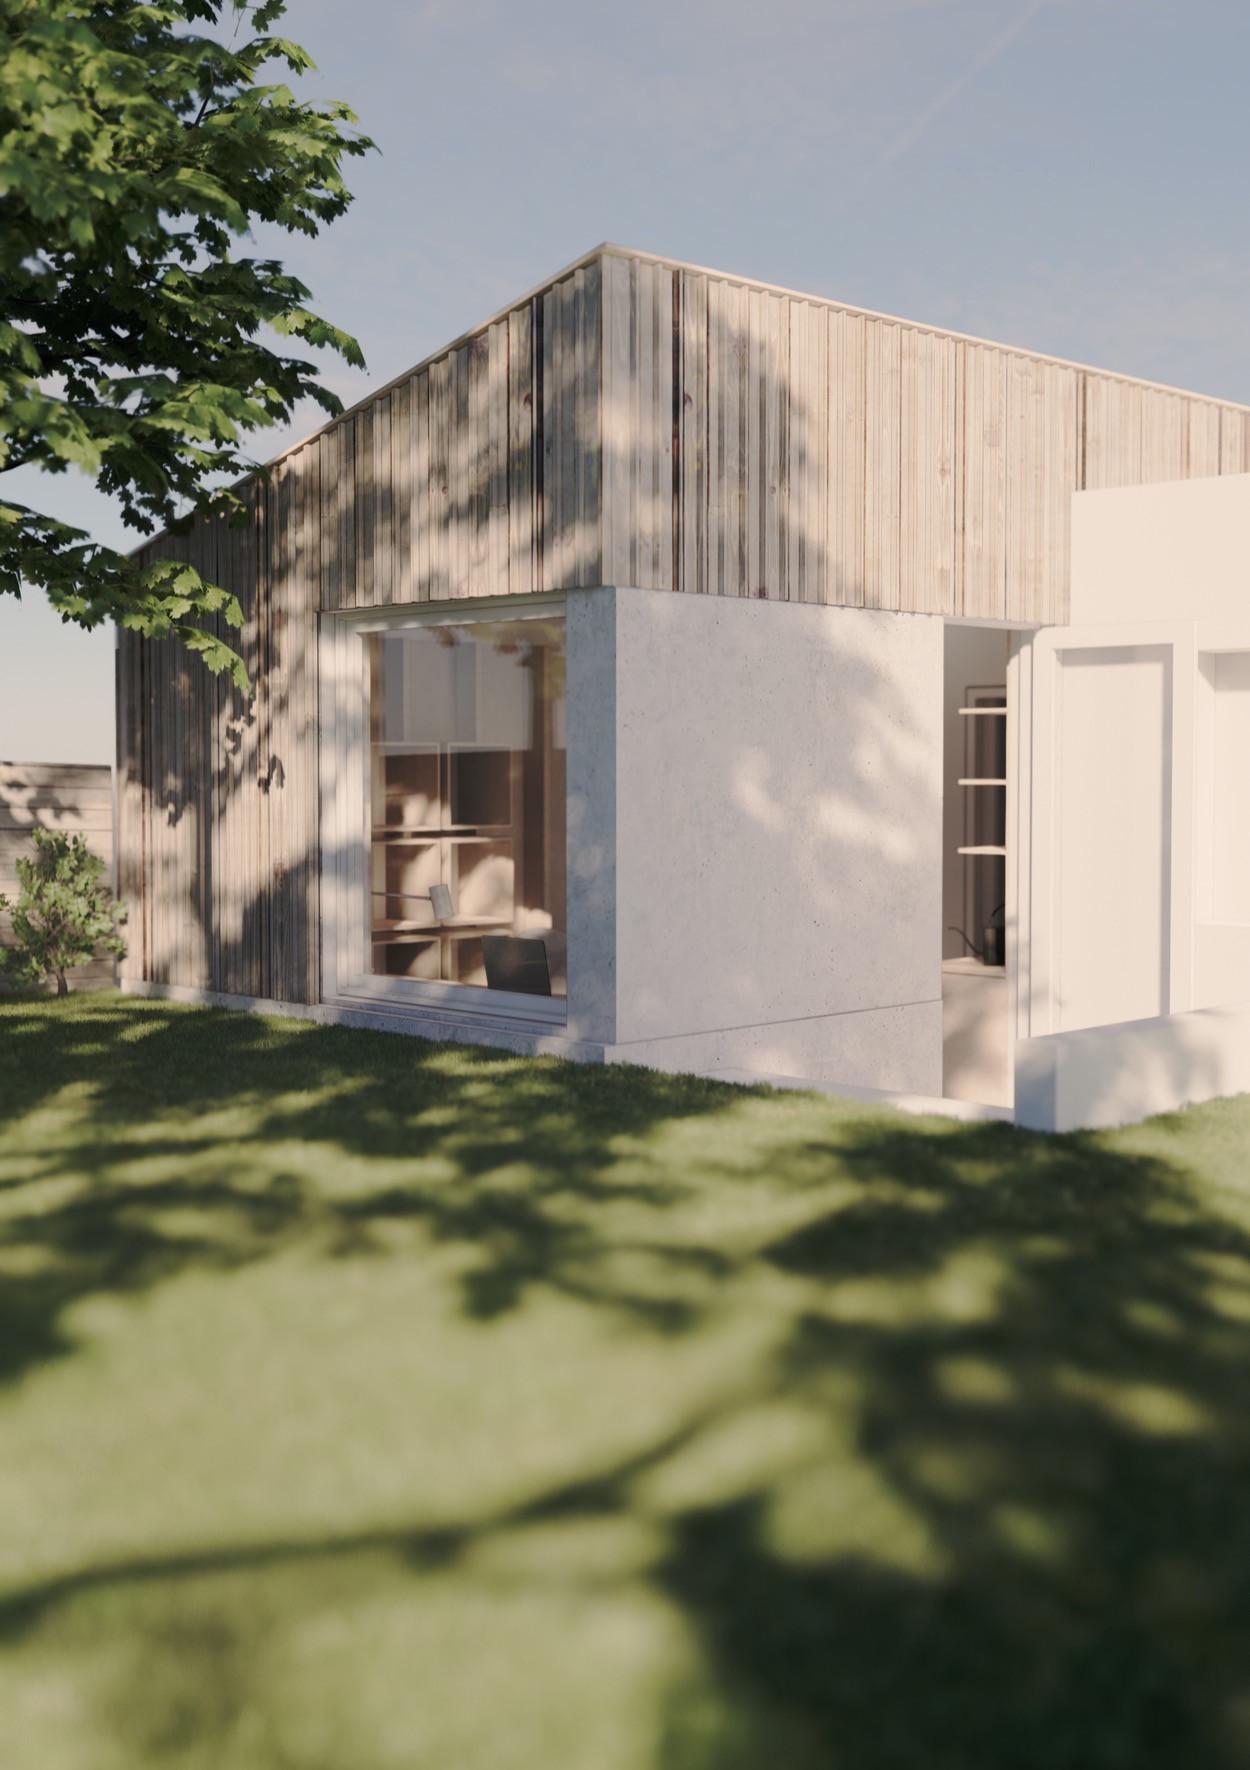 New build garden extension